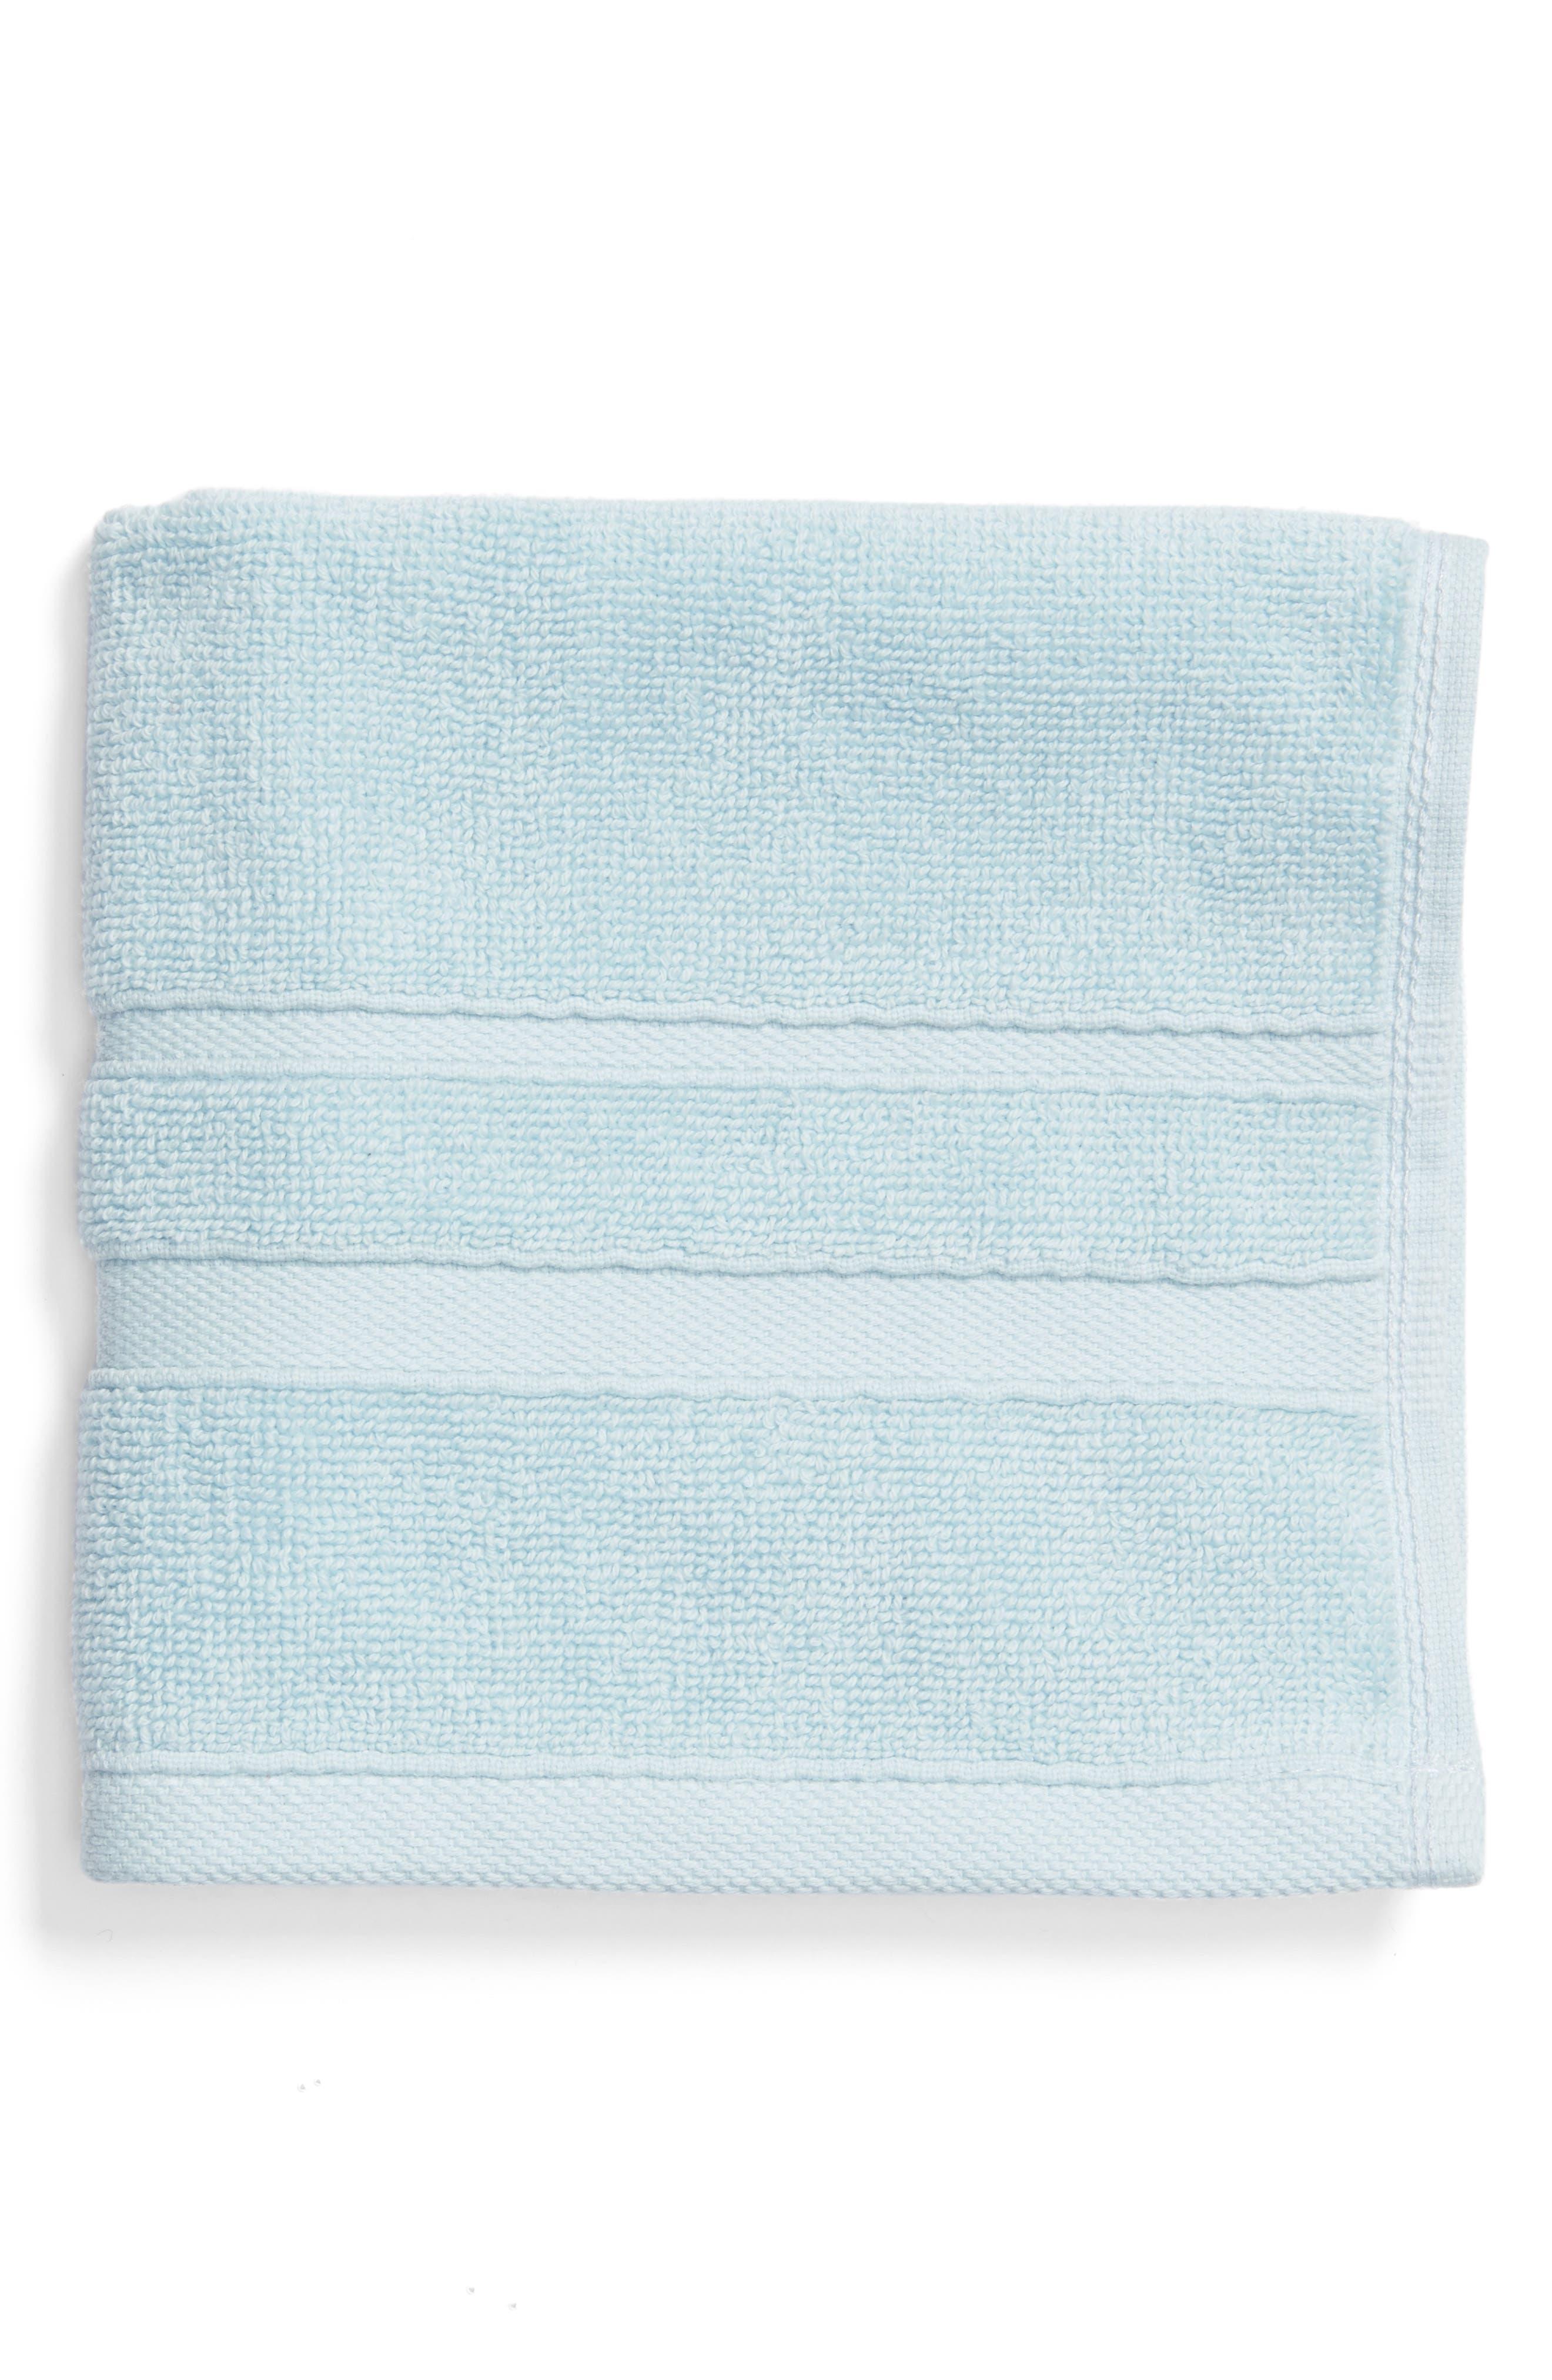 WATERWORKS STUDIO, 'Perennial' Combed Turkish Cotton Washcloth, Main thumbnail 1, color, CHRYSTAL BLUE